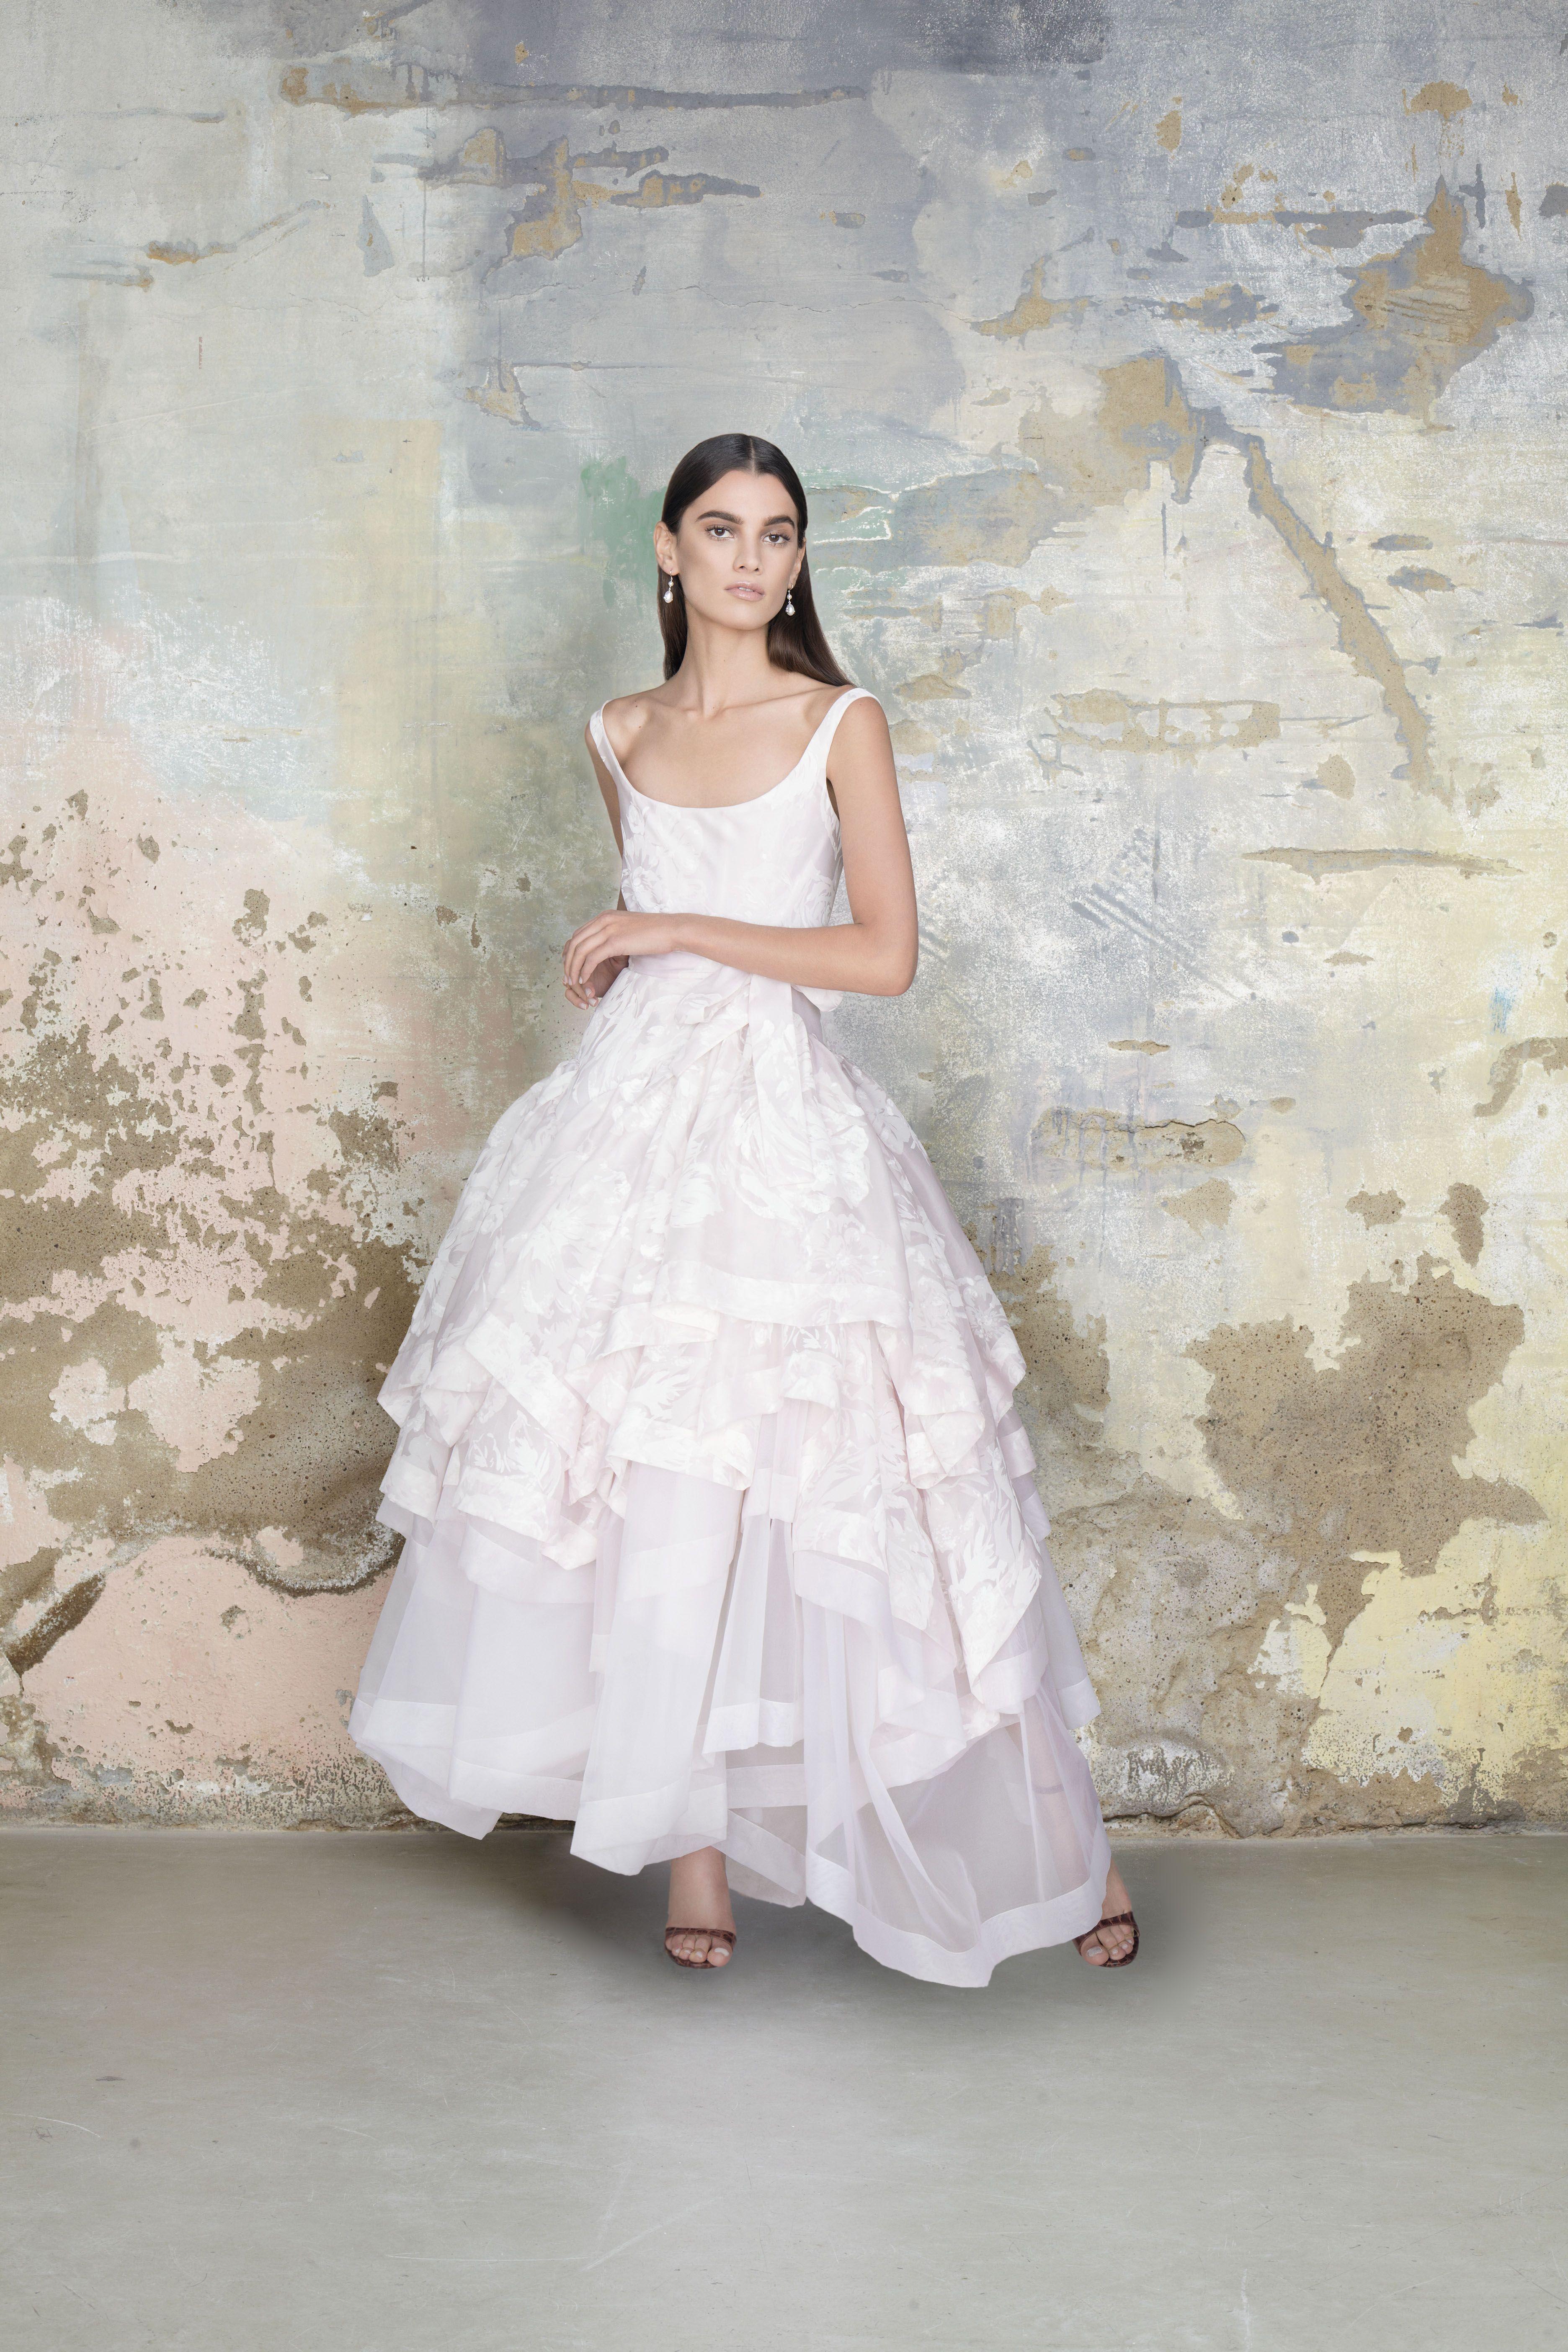 Vivienne westwood wedding dress  Embody a ballerina bride on your wedding day in the Vivienne